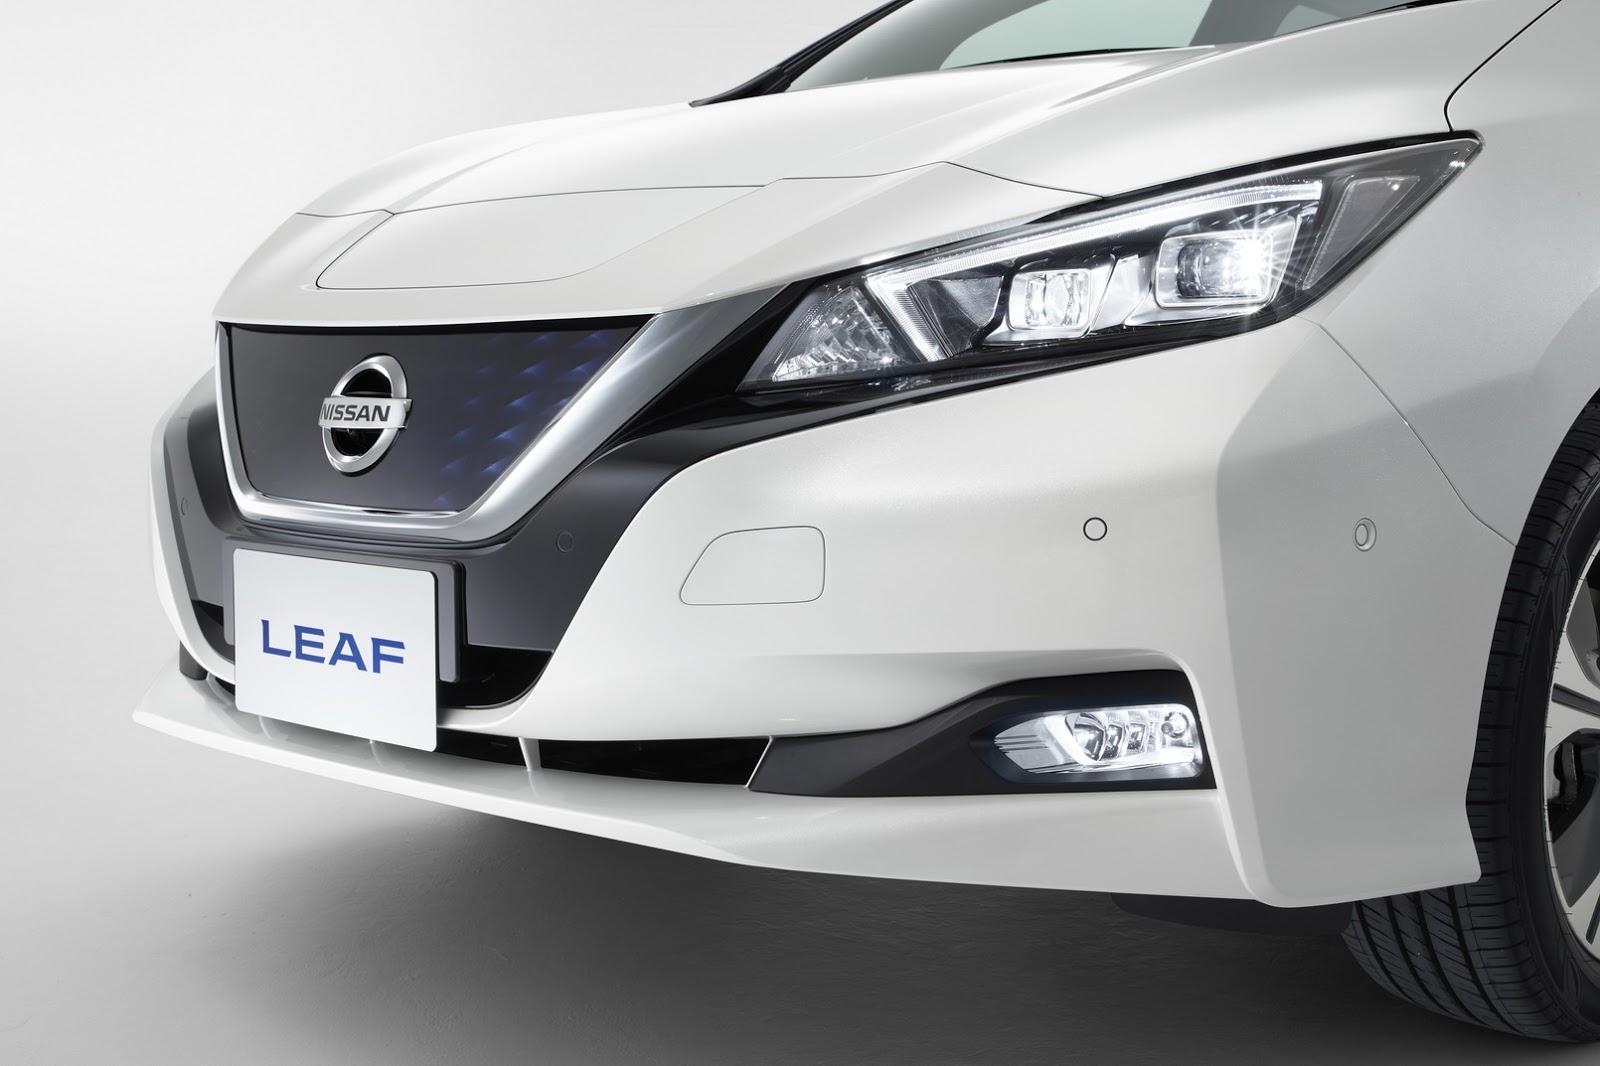 Nissan Leaf 2018 EU (17)